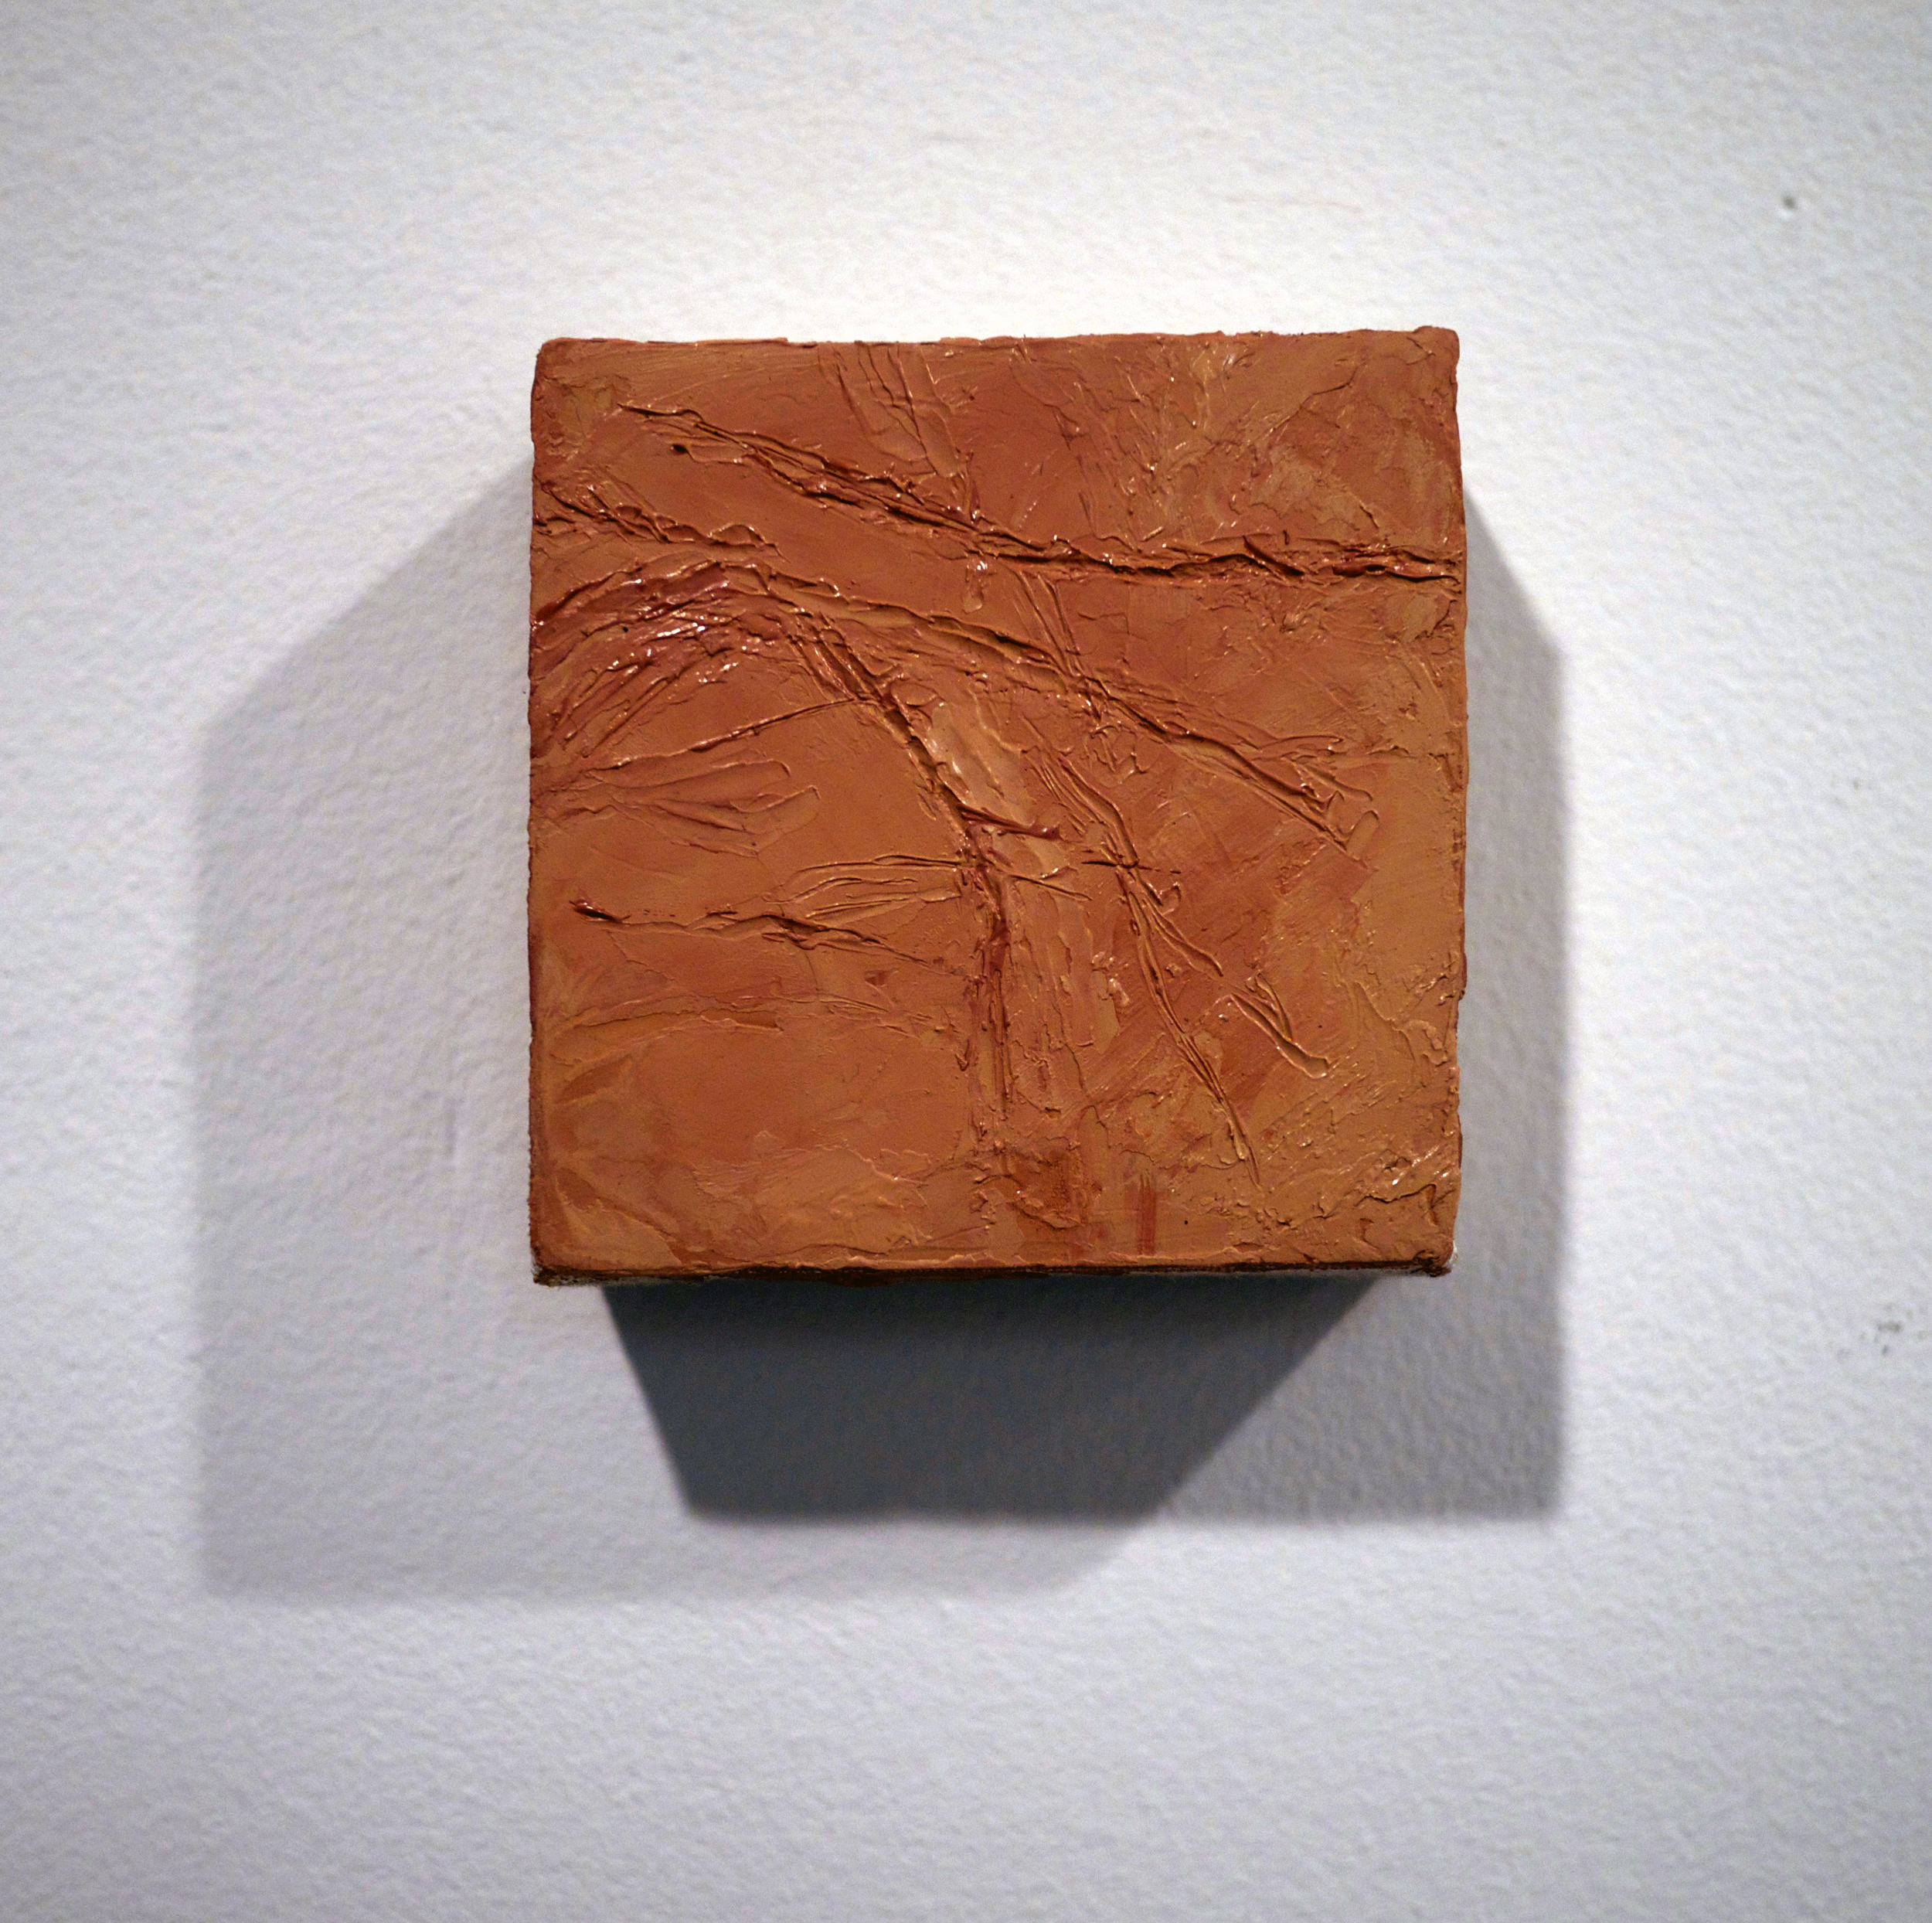 "Byron Kim. untitled. oil on linen. 3.25"" x 3.25"". 2013."